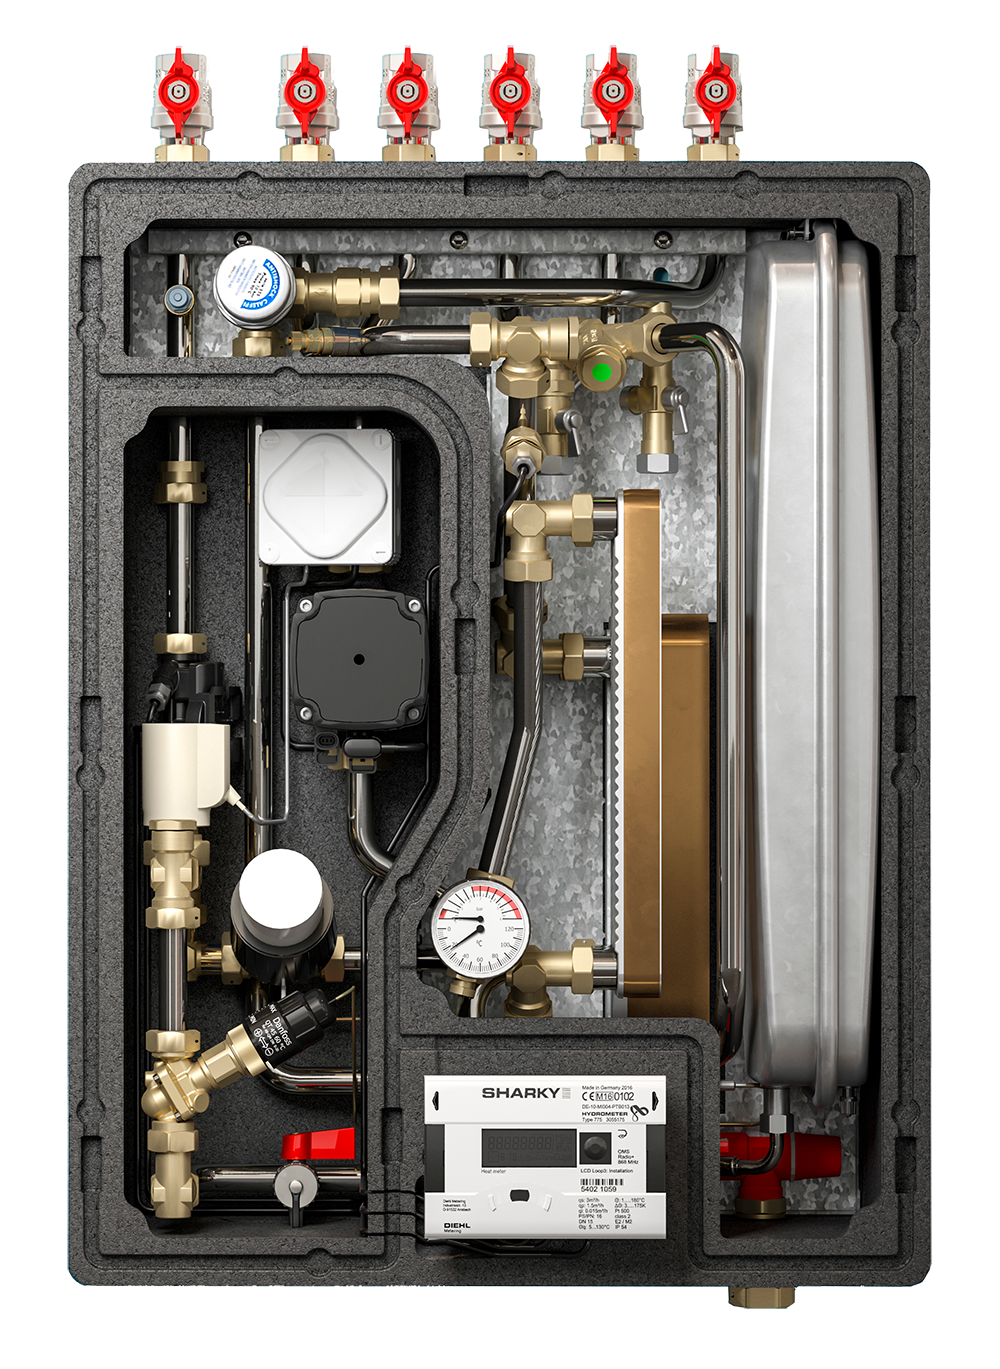 vTherm°t Thermostatic Unit